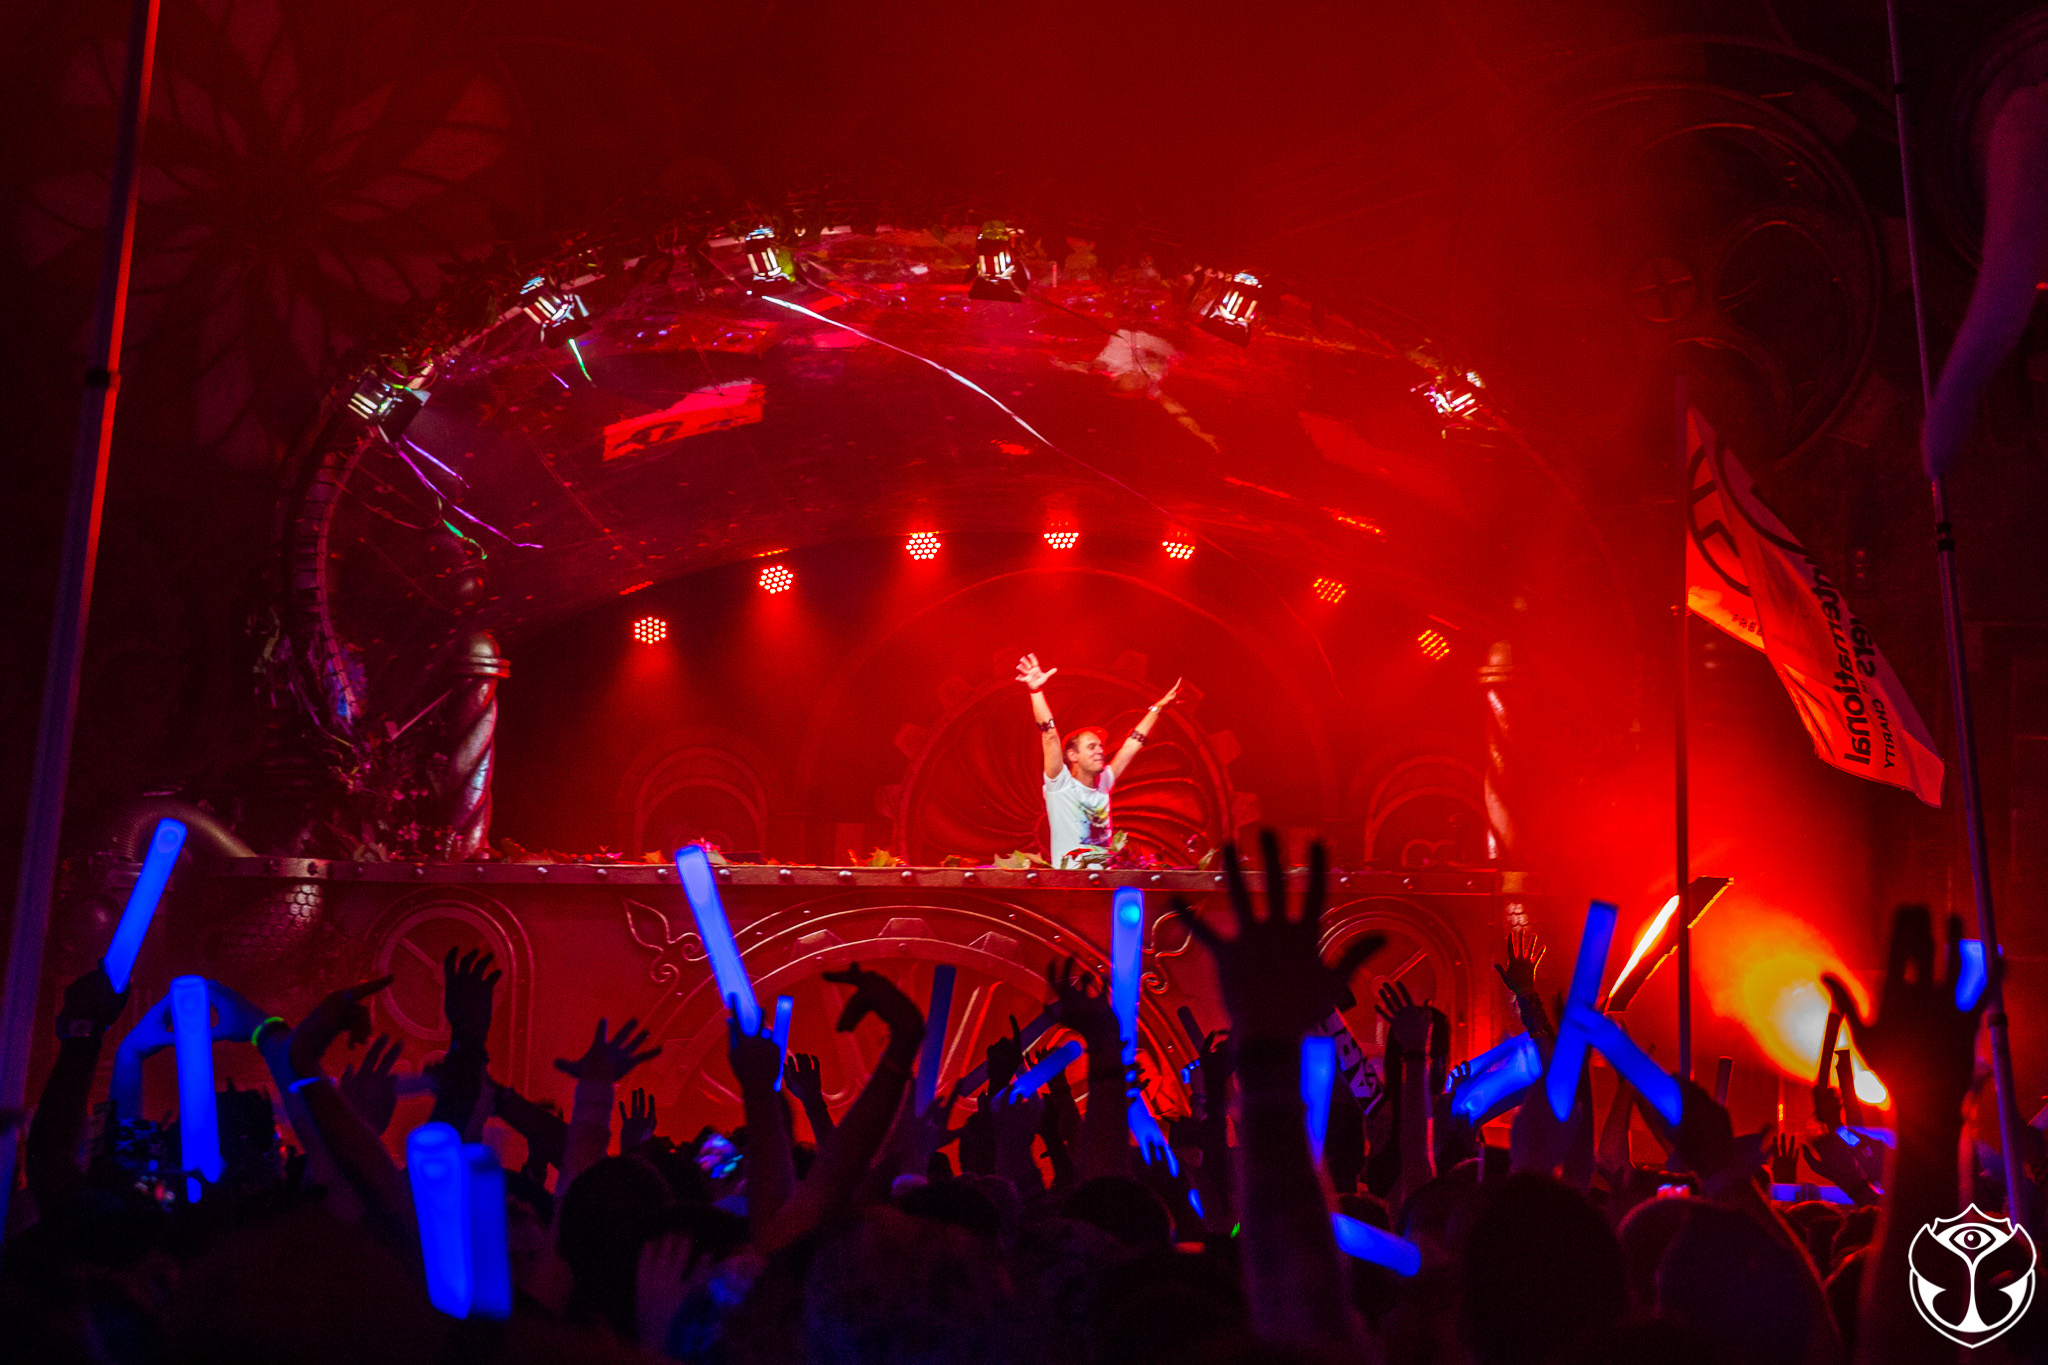 Armin Van Buuren at TomorrowWorld 2015. Photo: Marc Van Der Aa